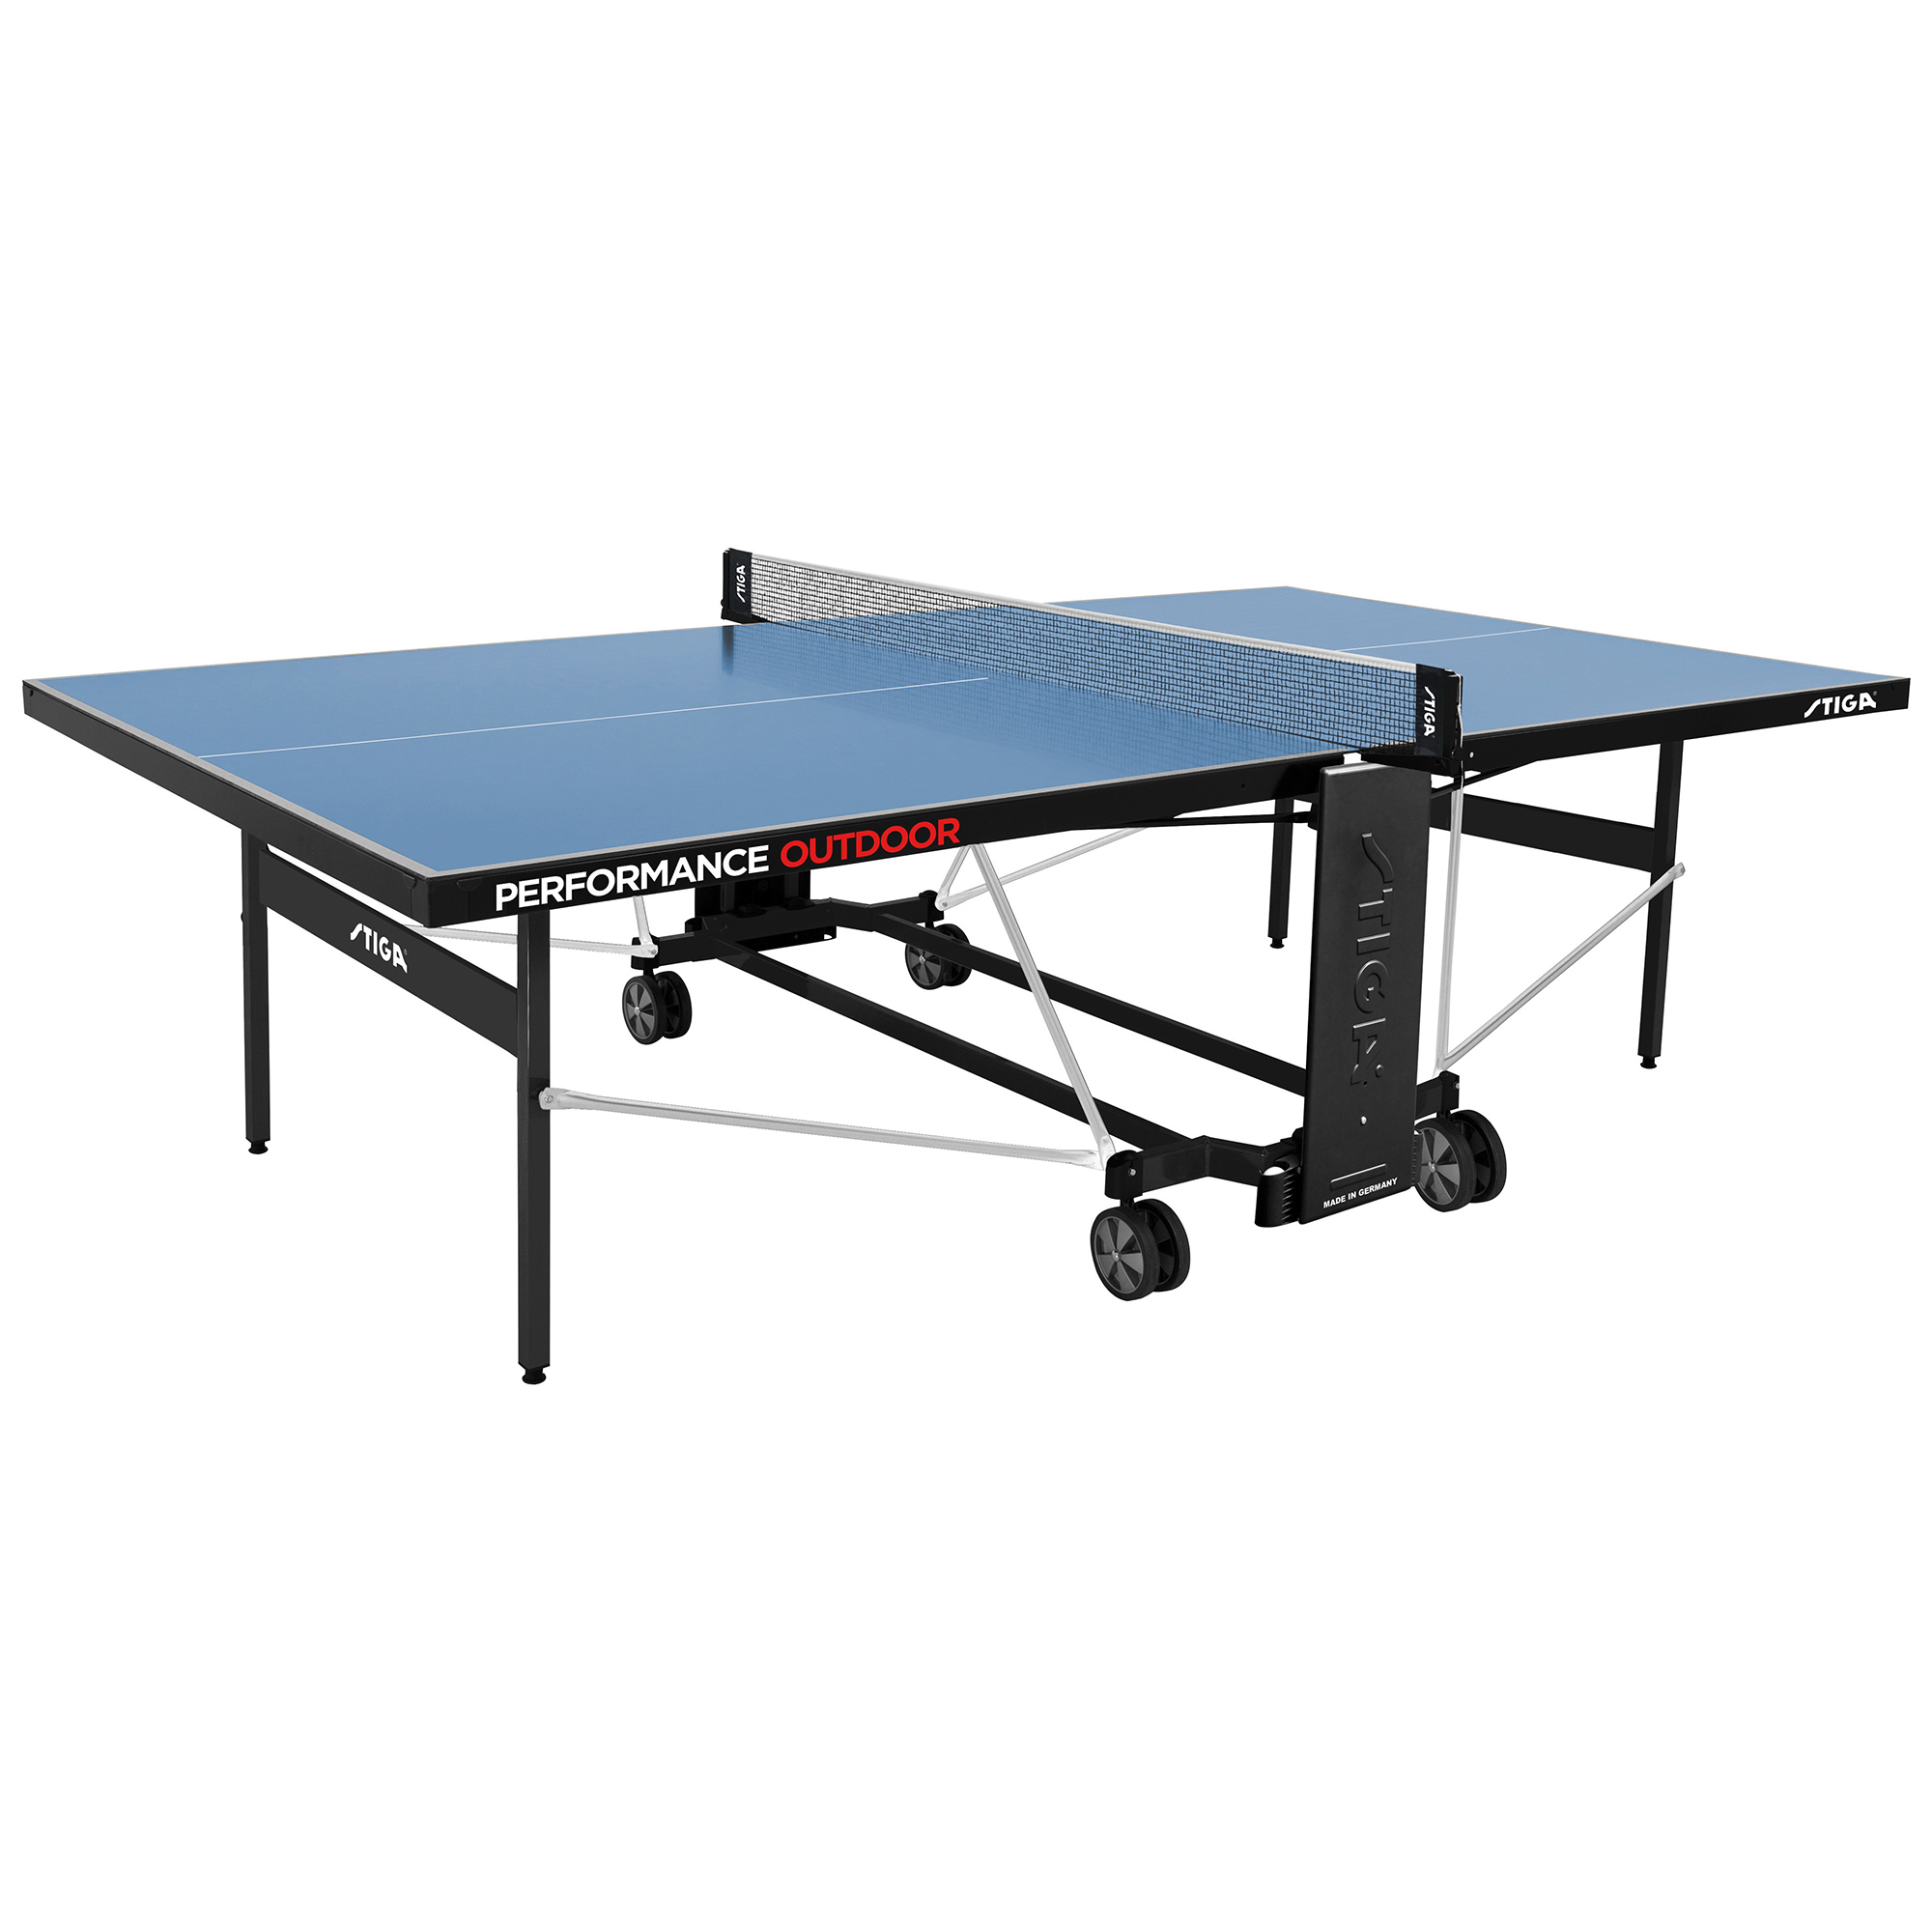 Stiga winner outdoor table tennis table - Weatherproof table tennis table ...